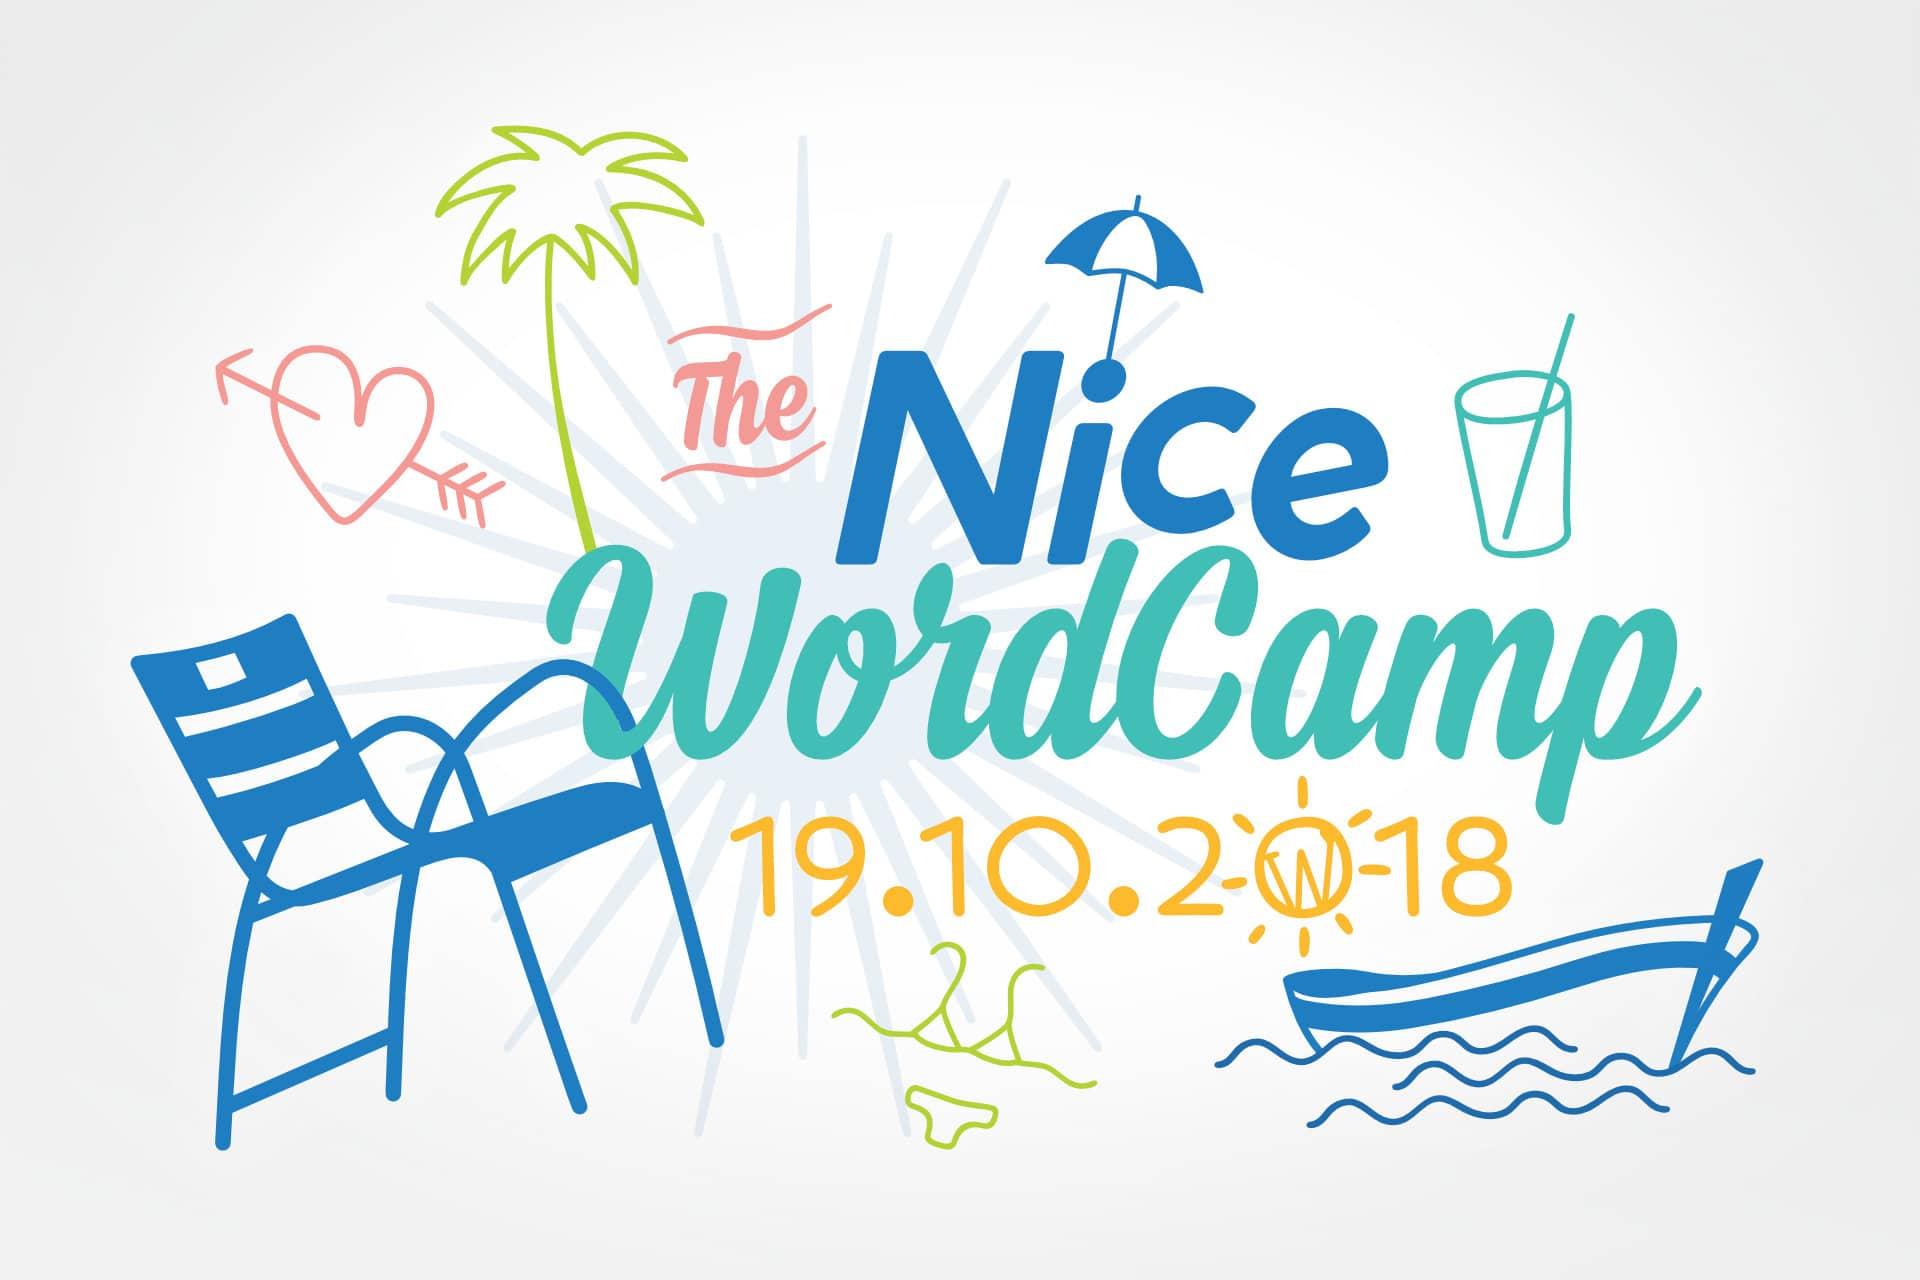 WordCamp Nice 2018, identité visuelle - Anybodesign